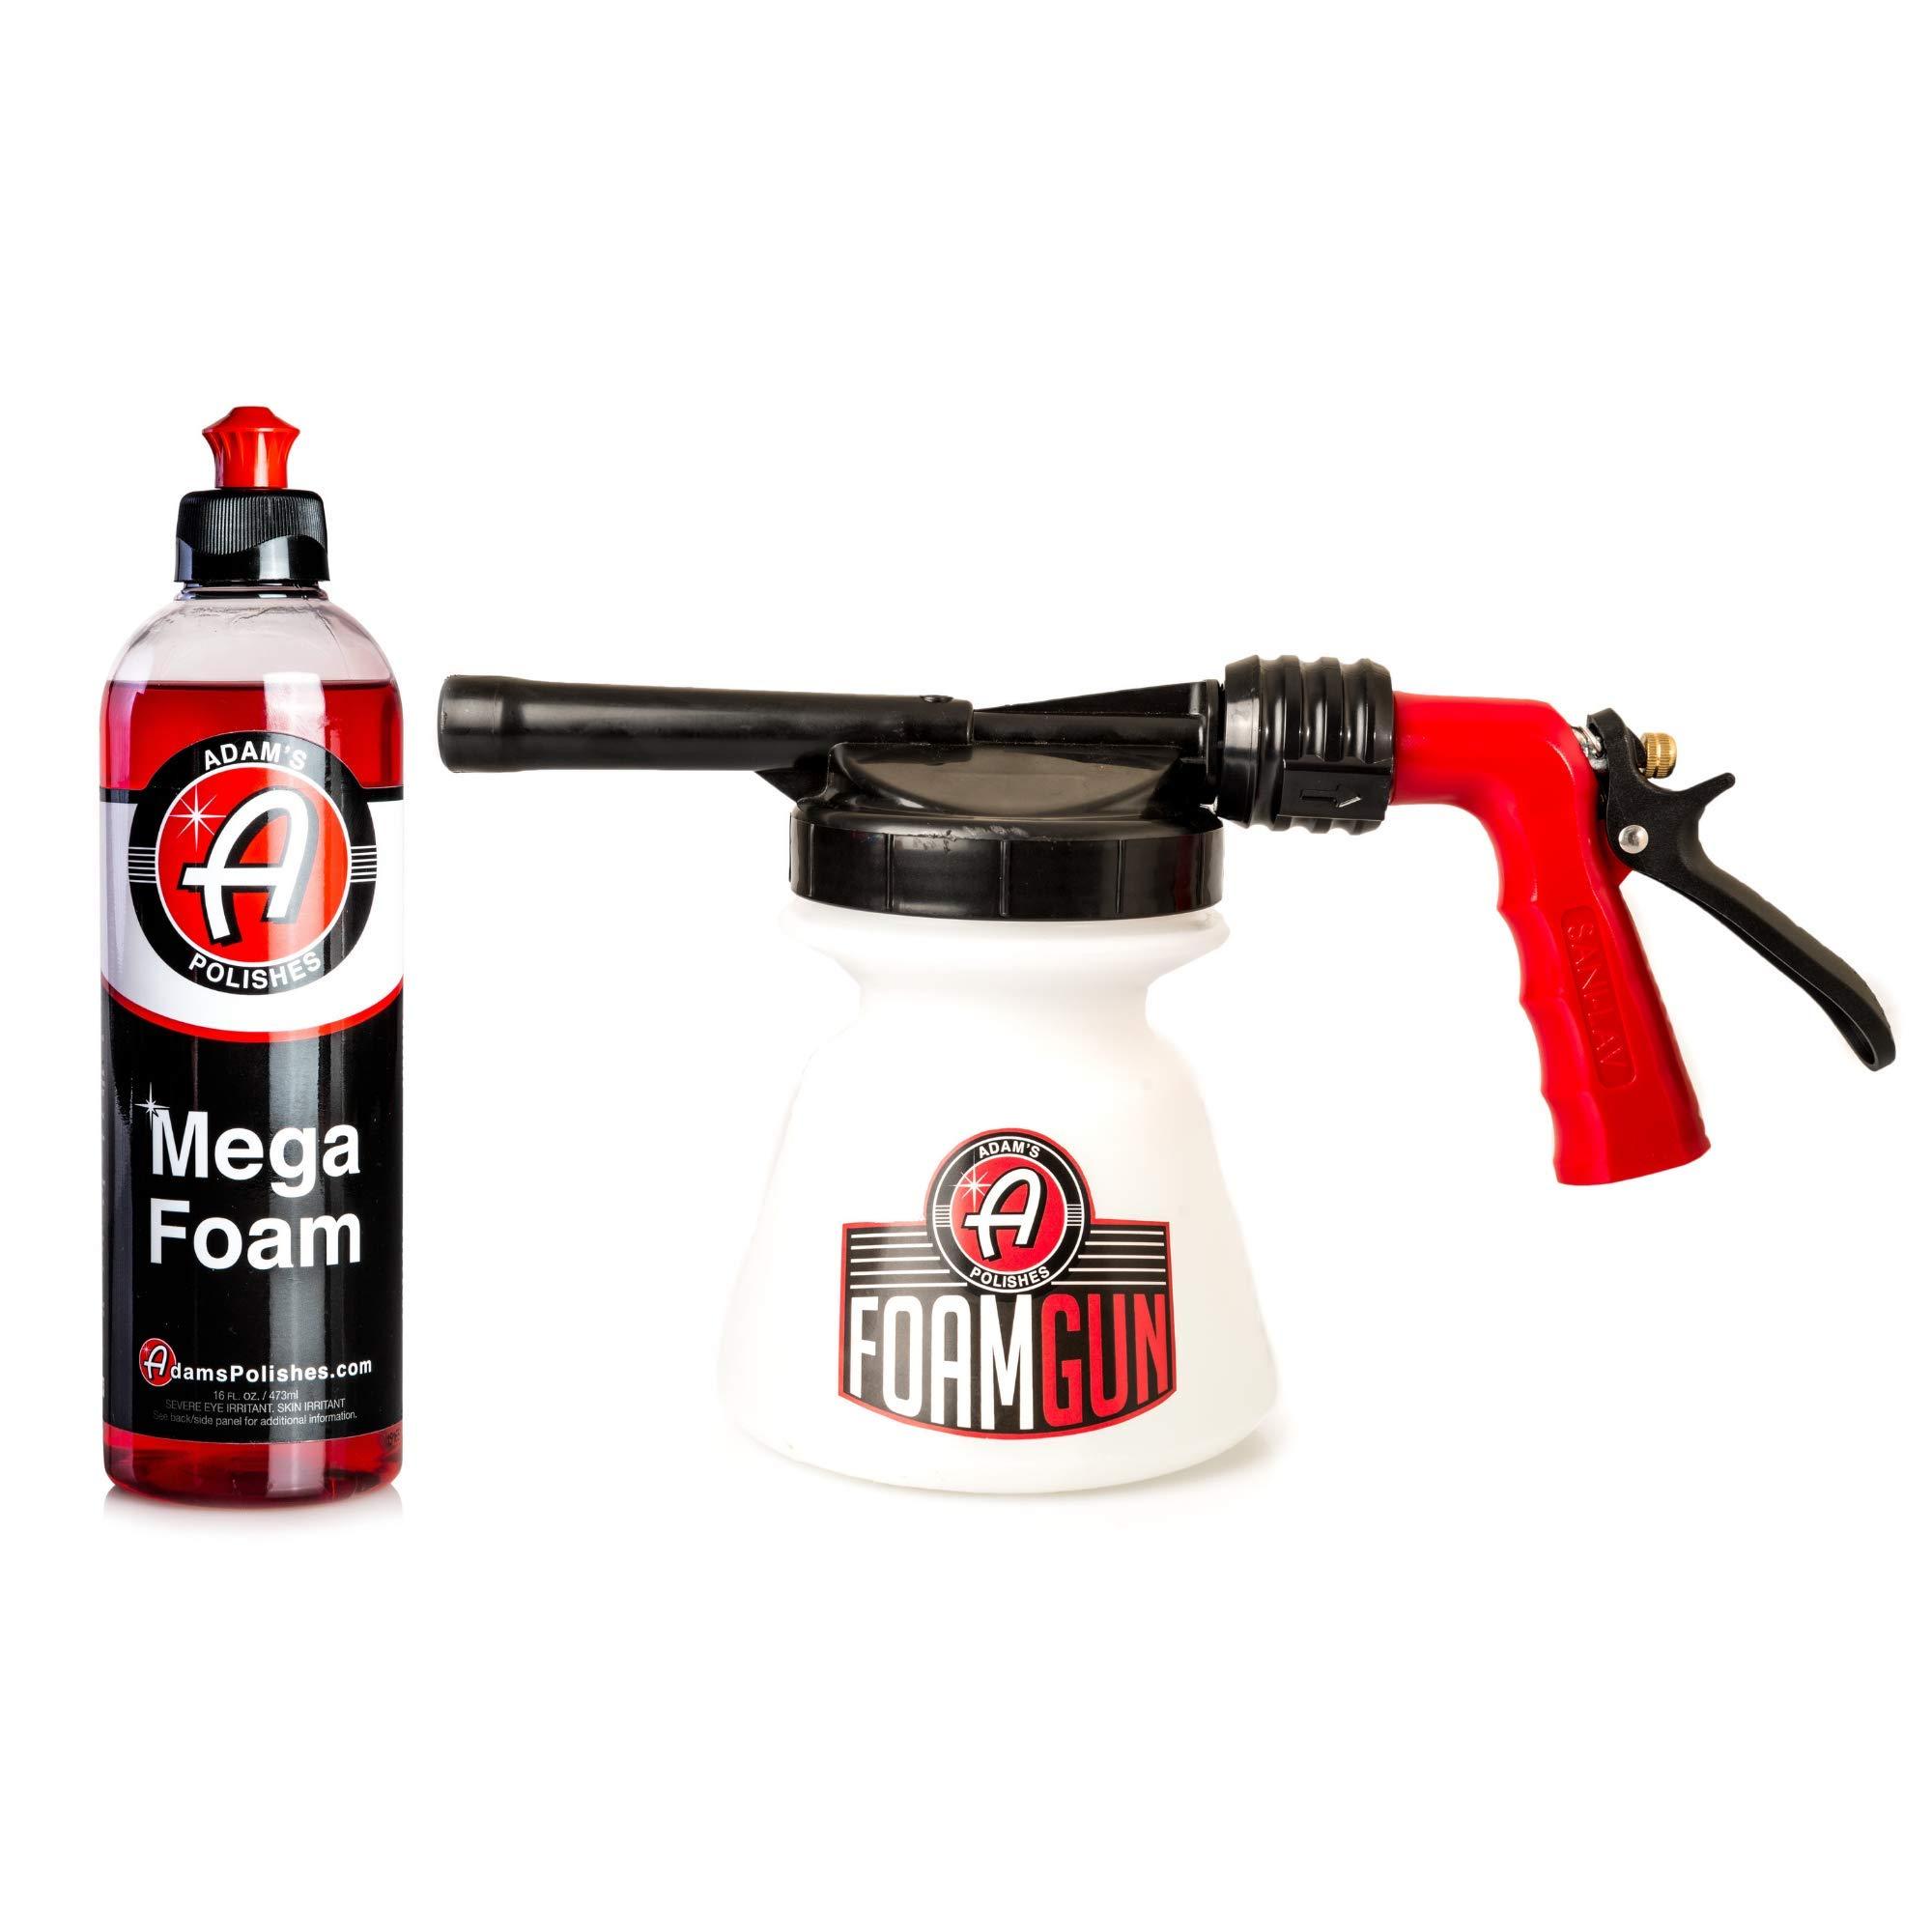 Adam's Standard Foam Gun - Produces Thick, Sudsy Foam for Car Washing - Use with Regular Garden Hose - Fun, Efficient Way to Foam Down Your Vehicle (Foam Gun & 16 oz Mega Foam)